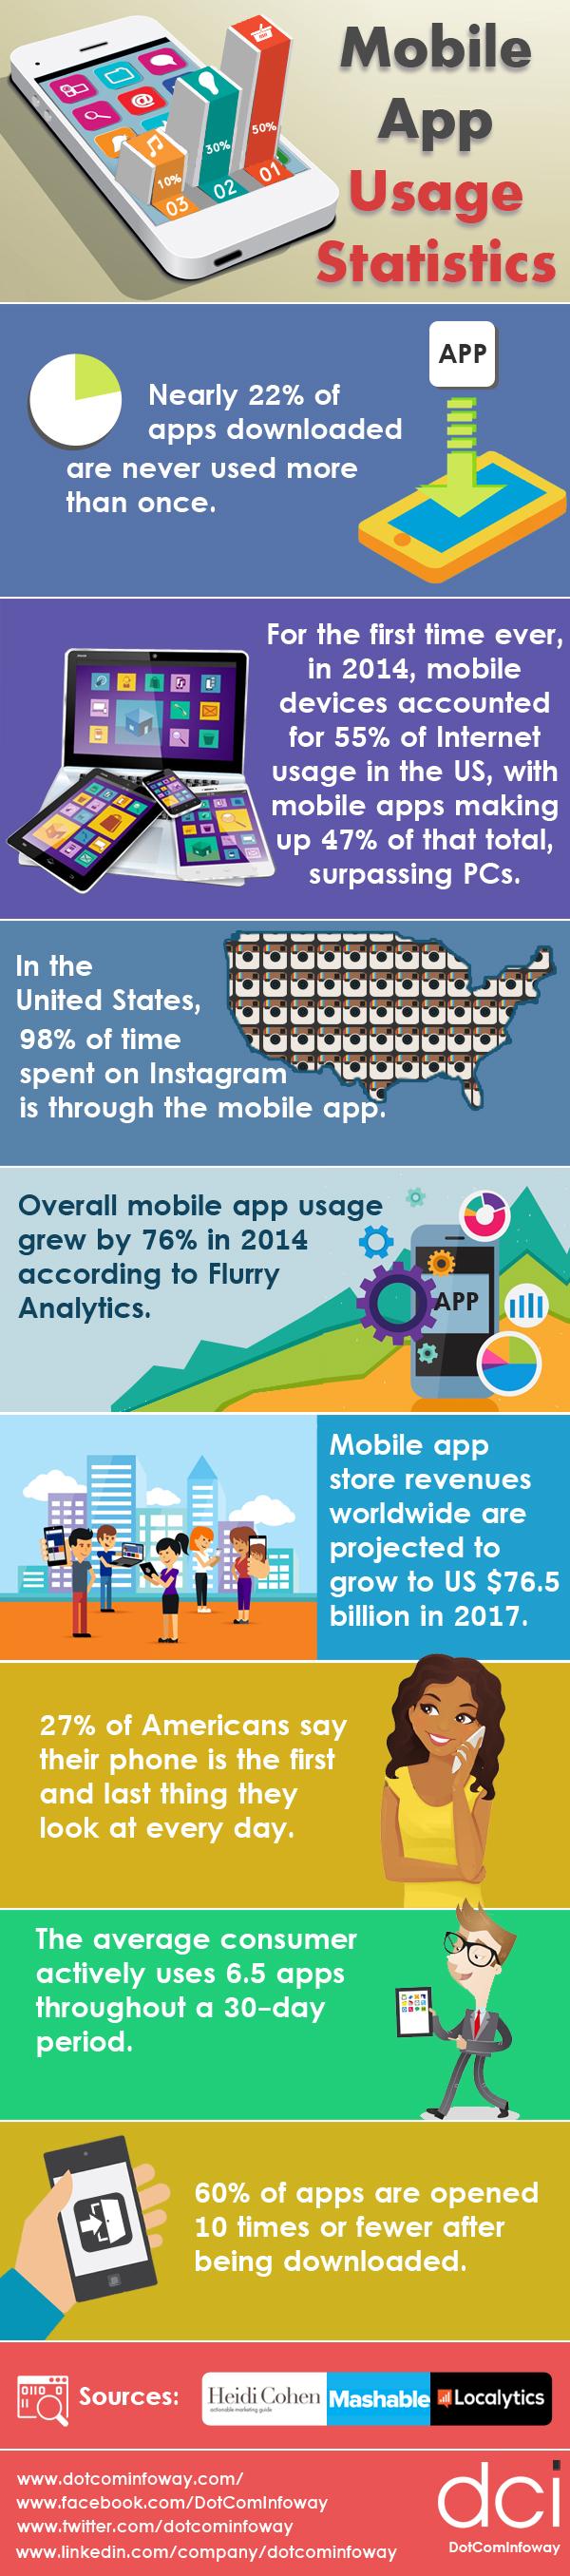 Mobile App Usage Statistics